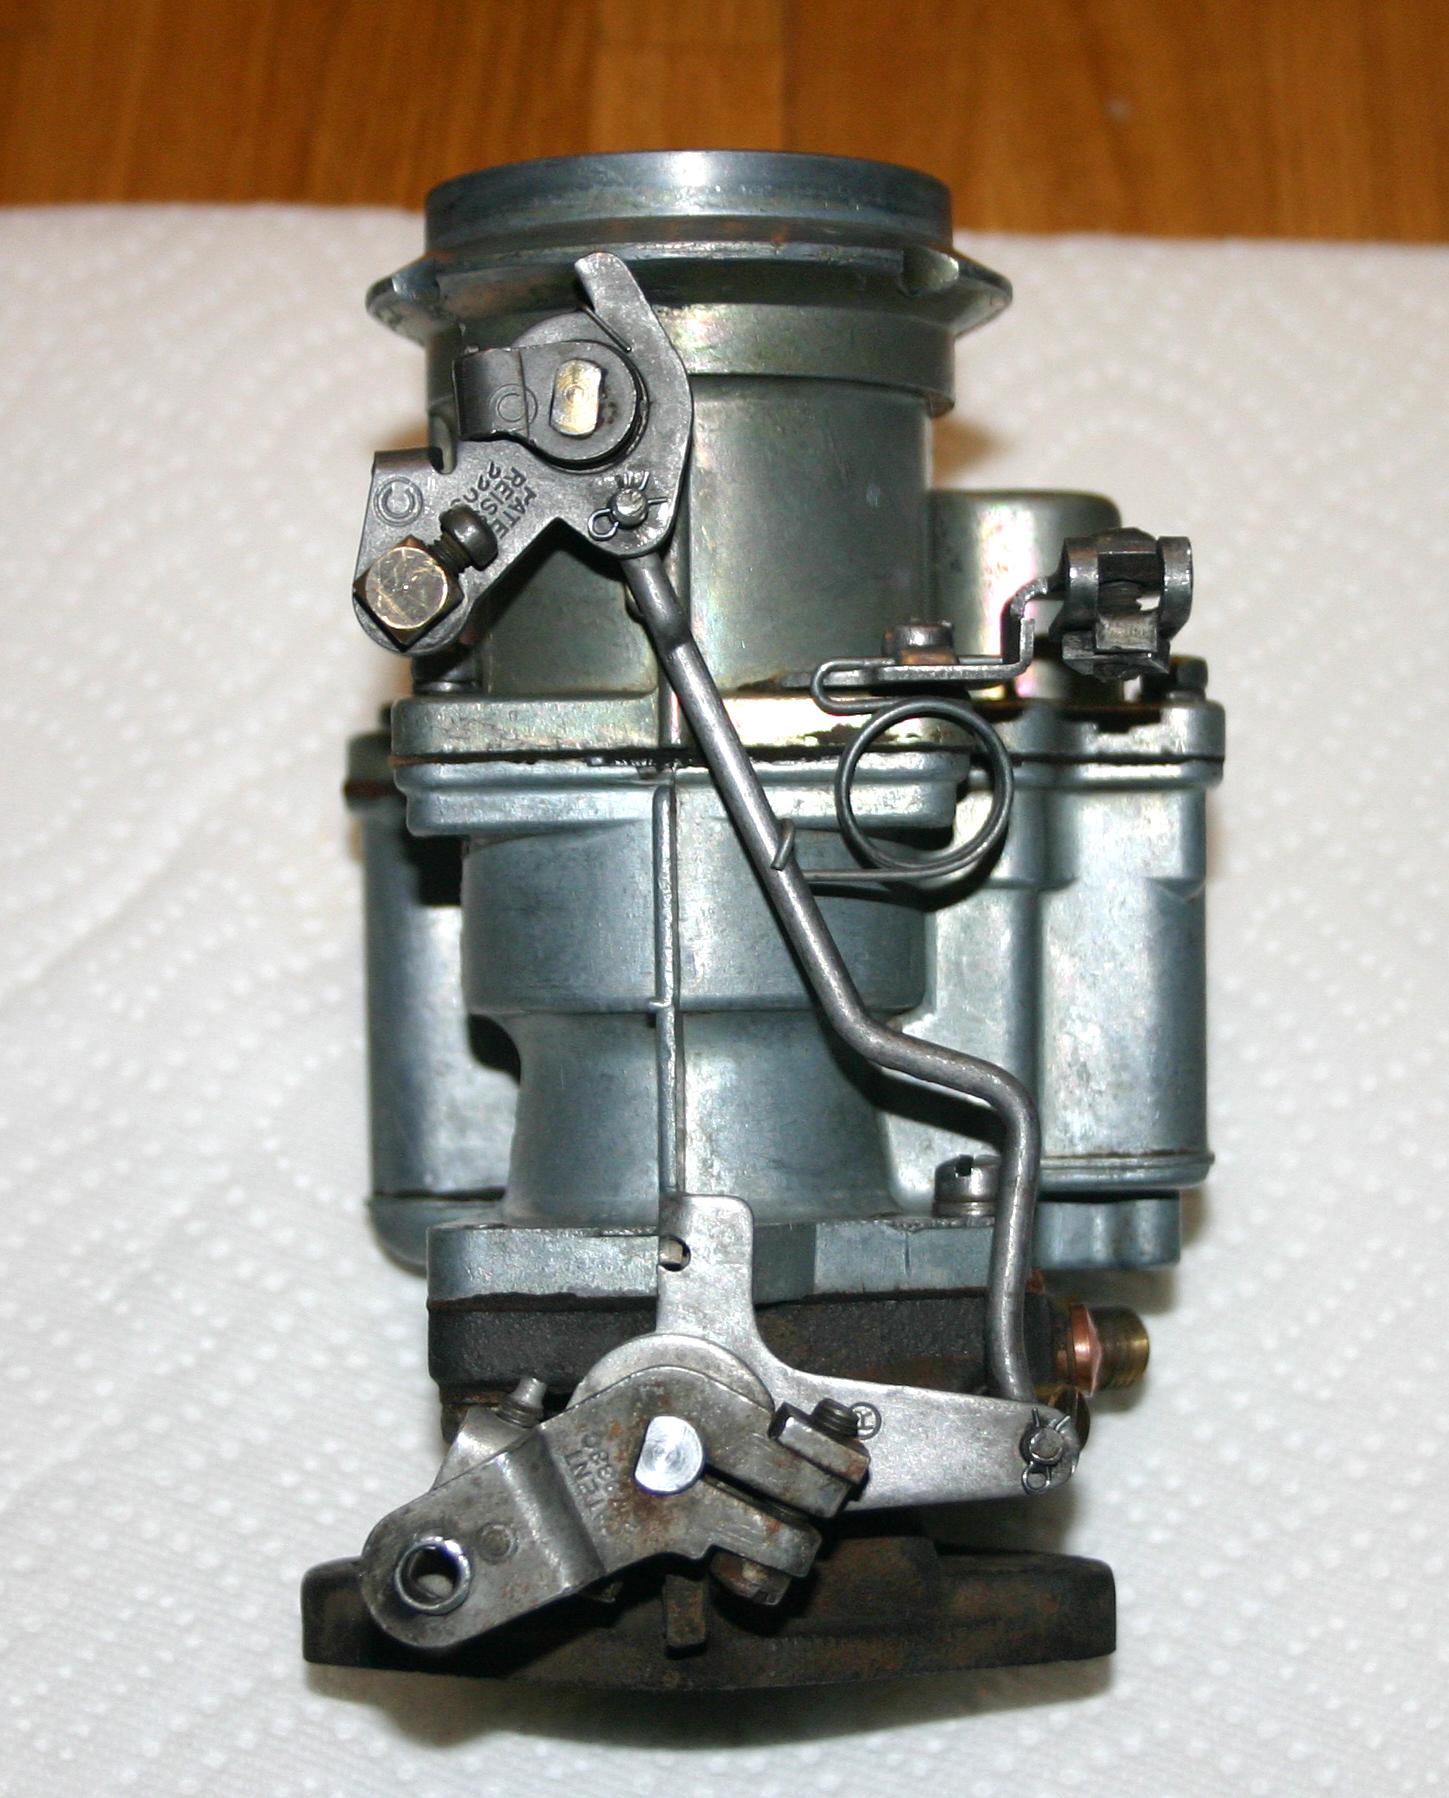 restoring cornelia truck facts carter yf carburetor rh hansenwebdesign com carter yf carburetor manual choke Carter YF Metering Rod Adjustment